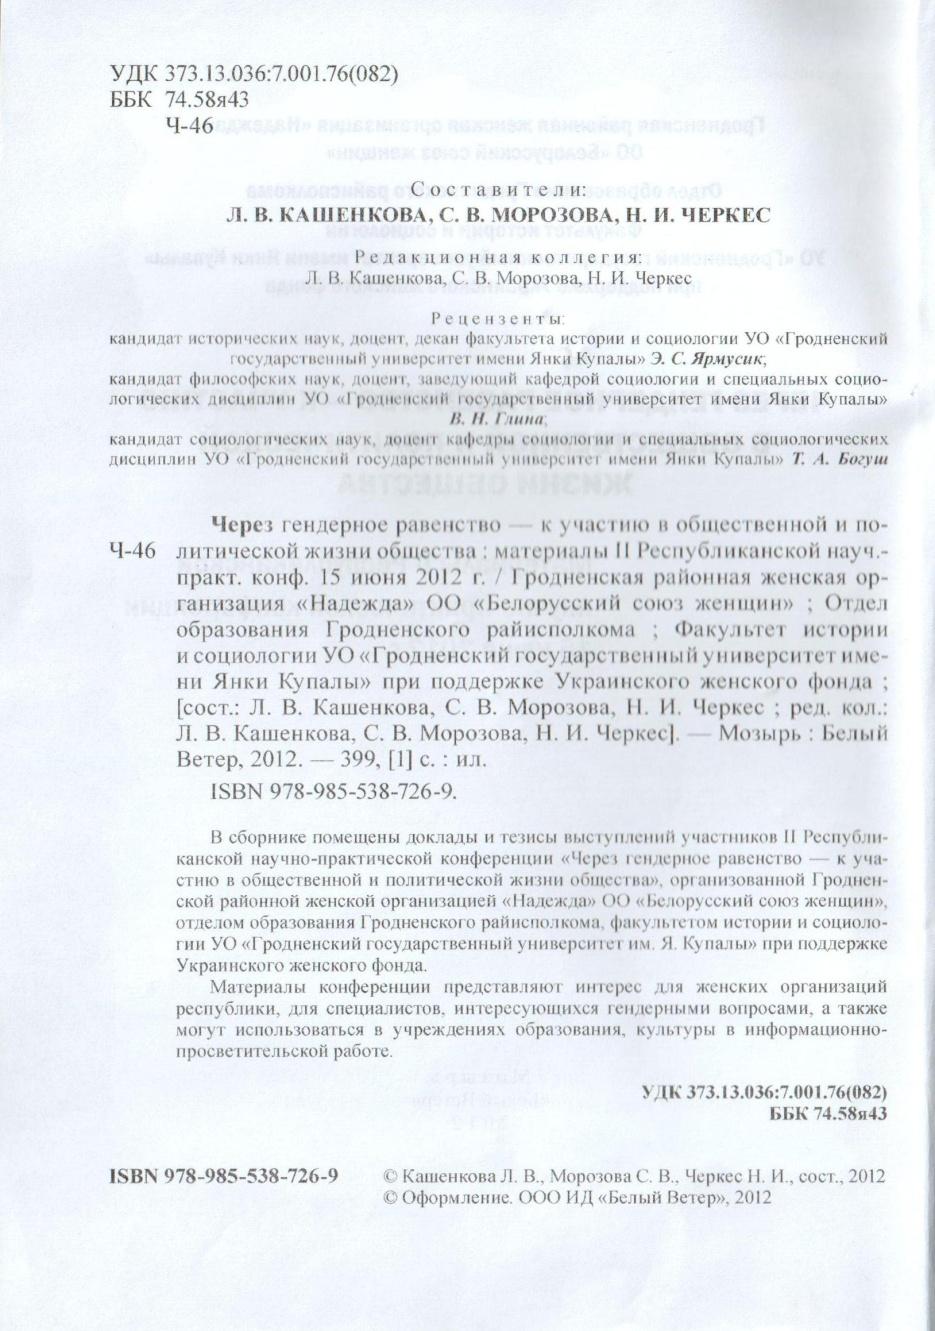 C:\Documents and Settings\Наталья\Рабочий стол\гендер11.jpg